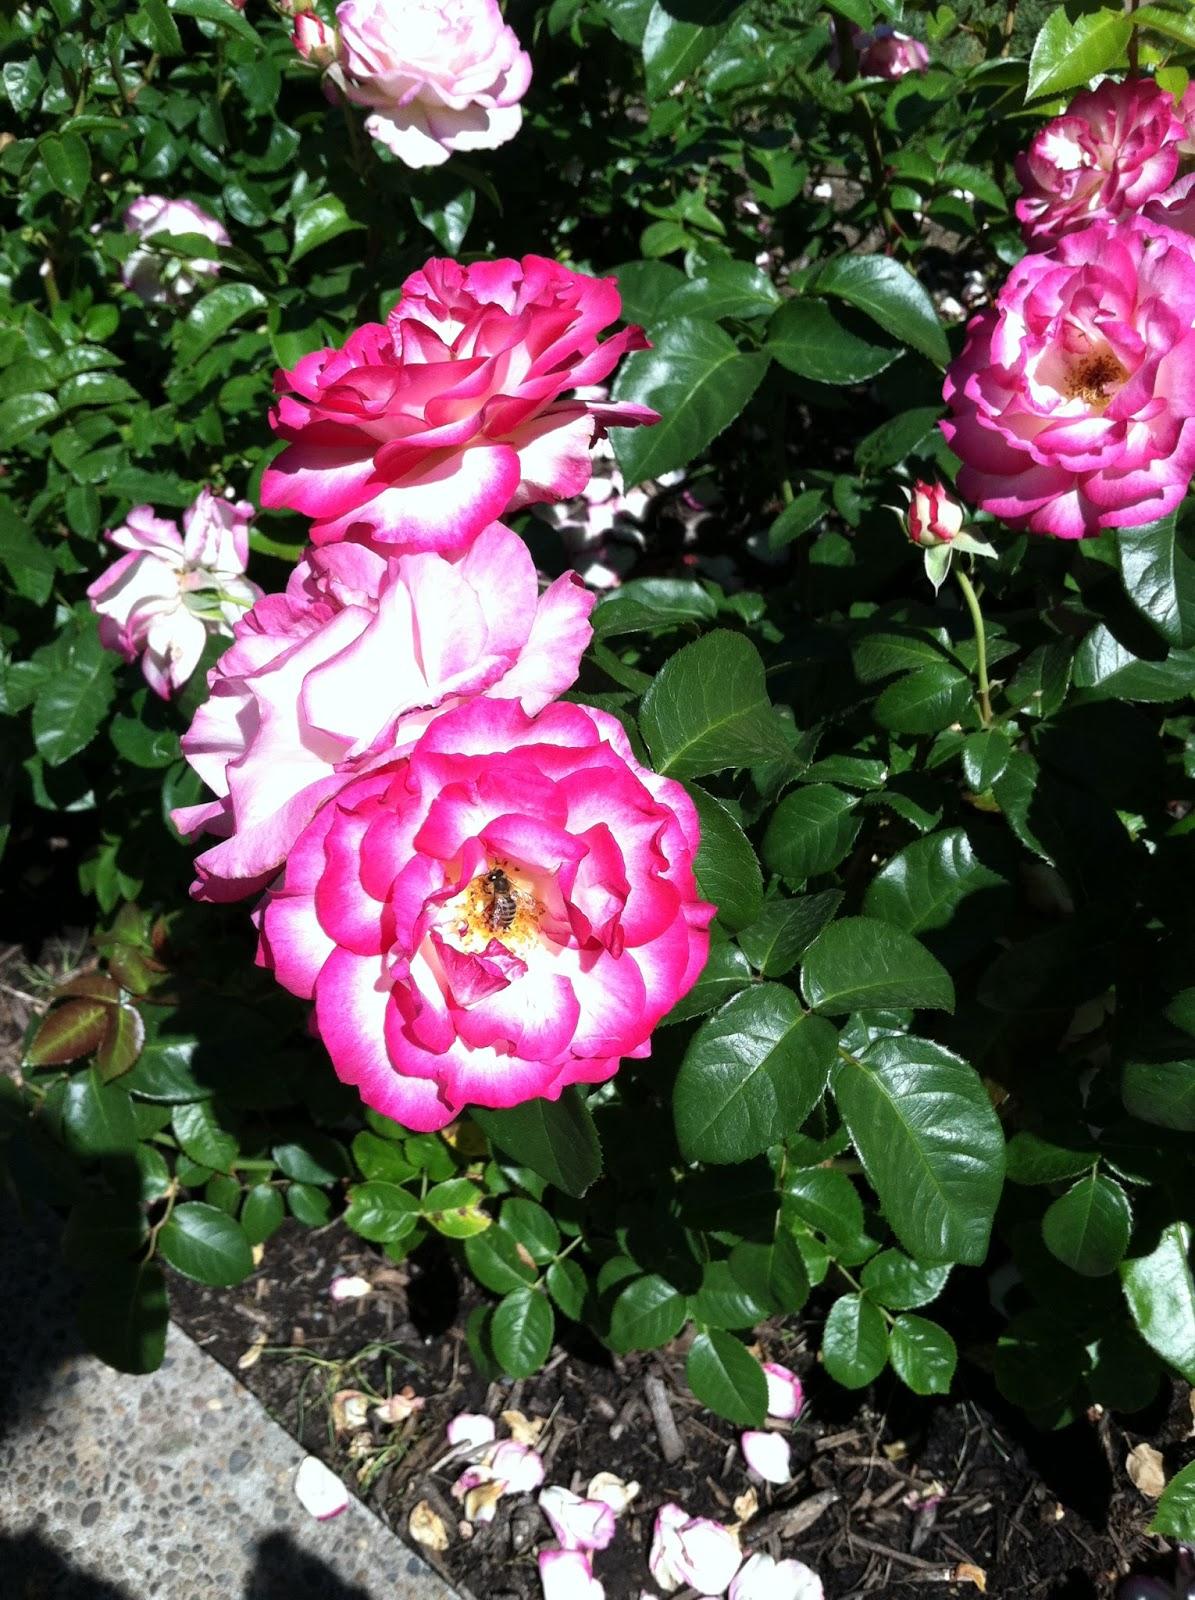 radish roses how to make